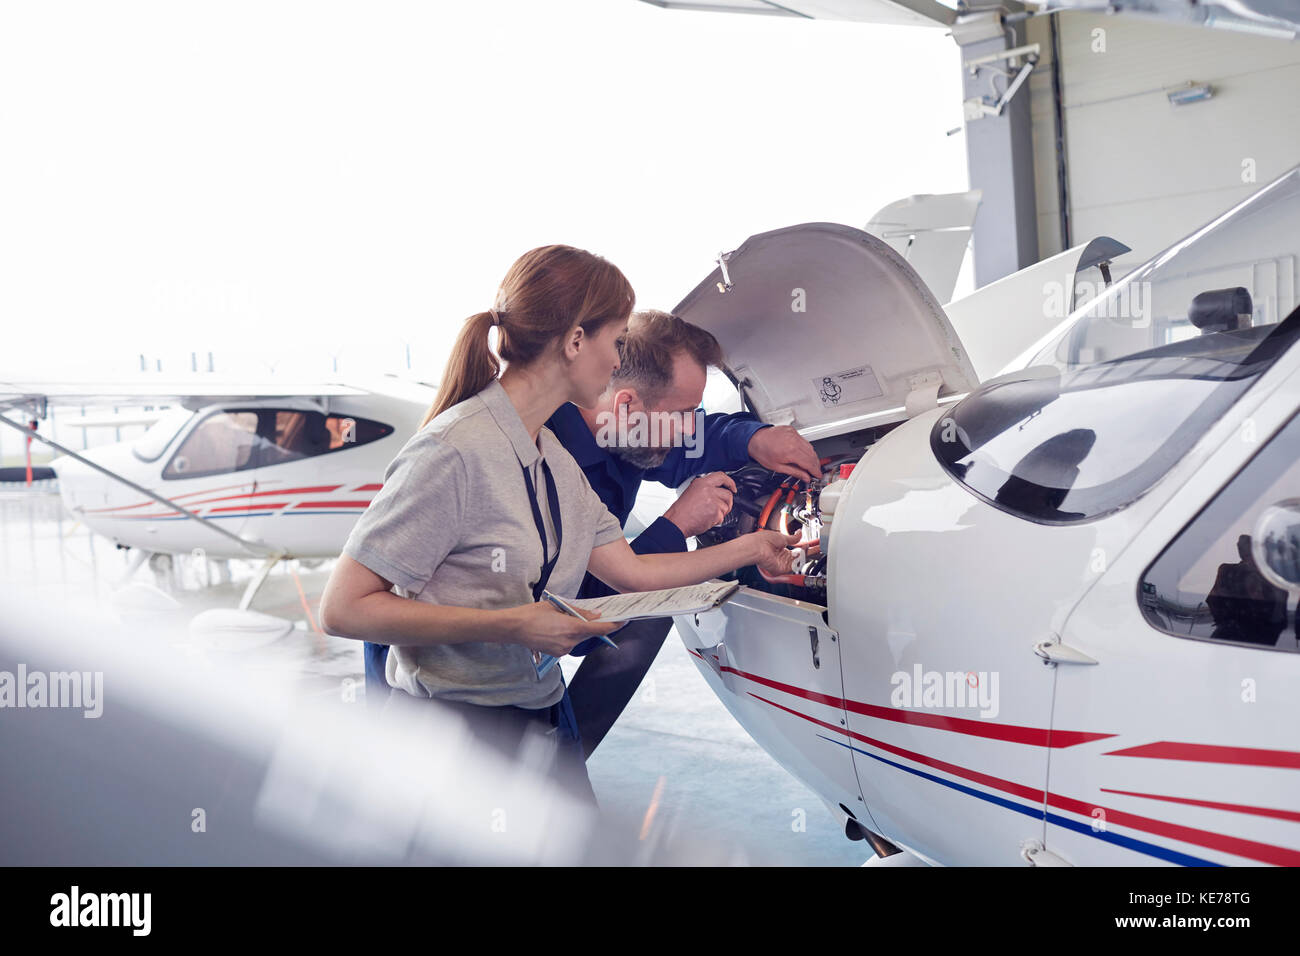 Engineer mechanics working on airplane engine in hangar Stock Photo